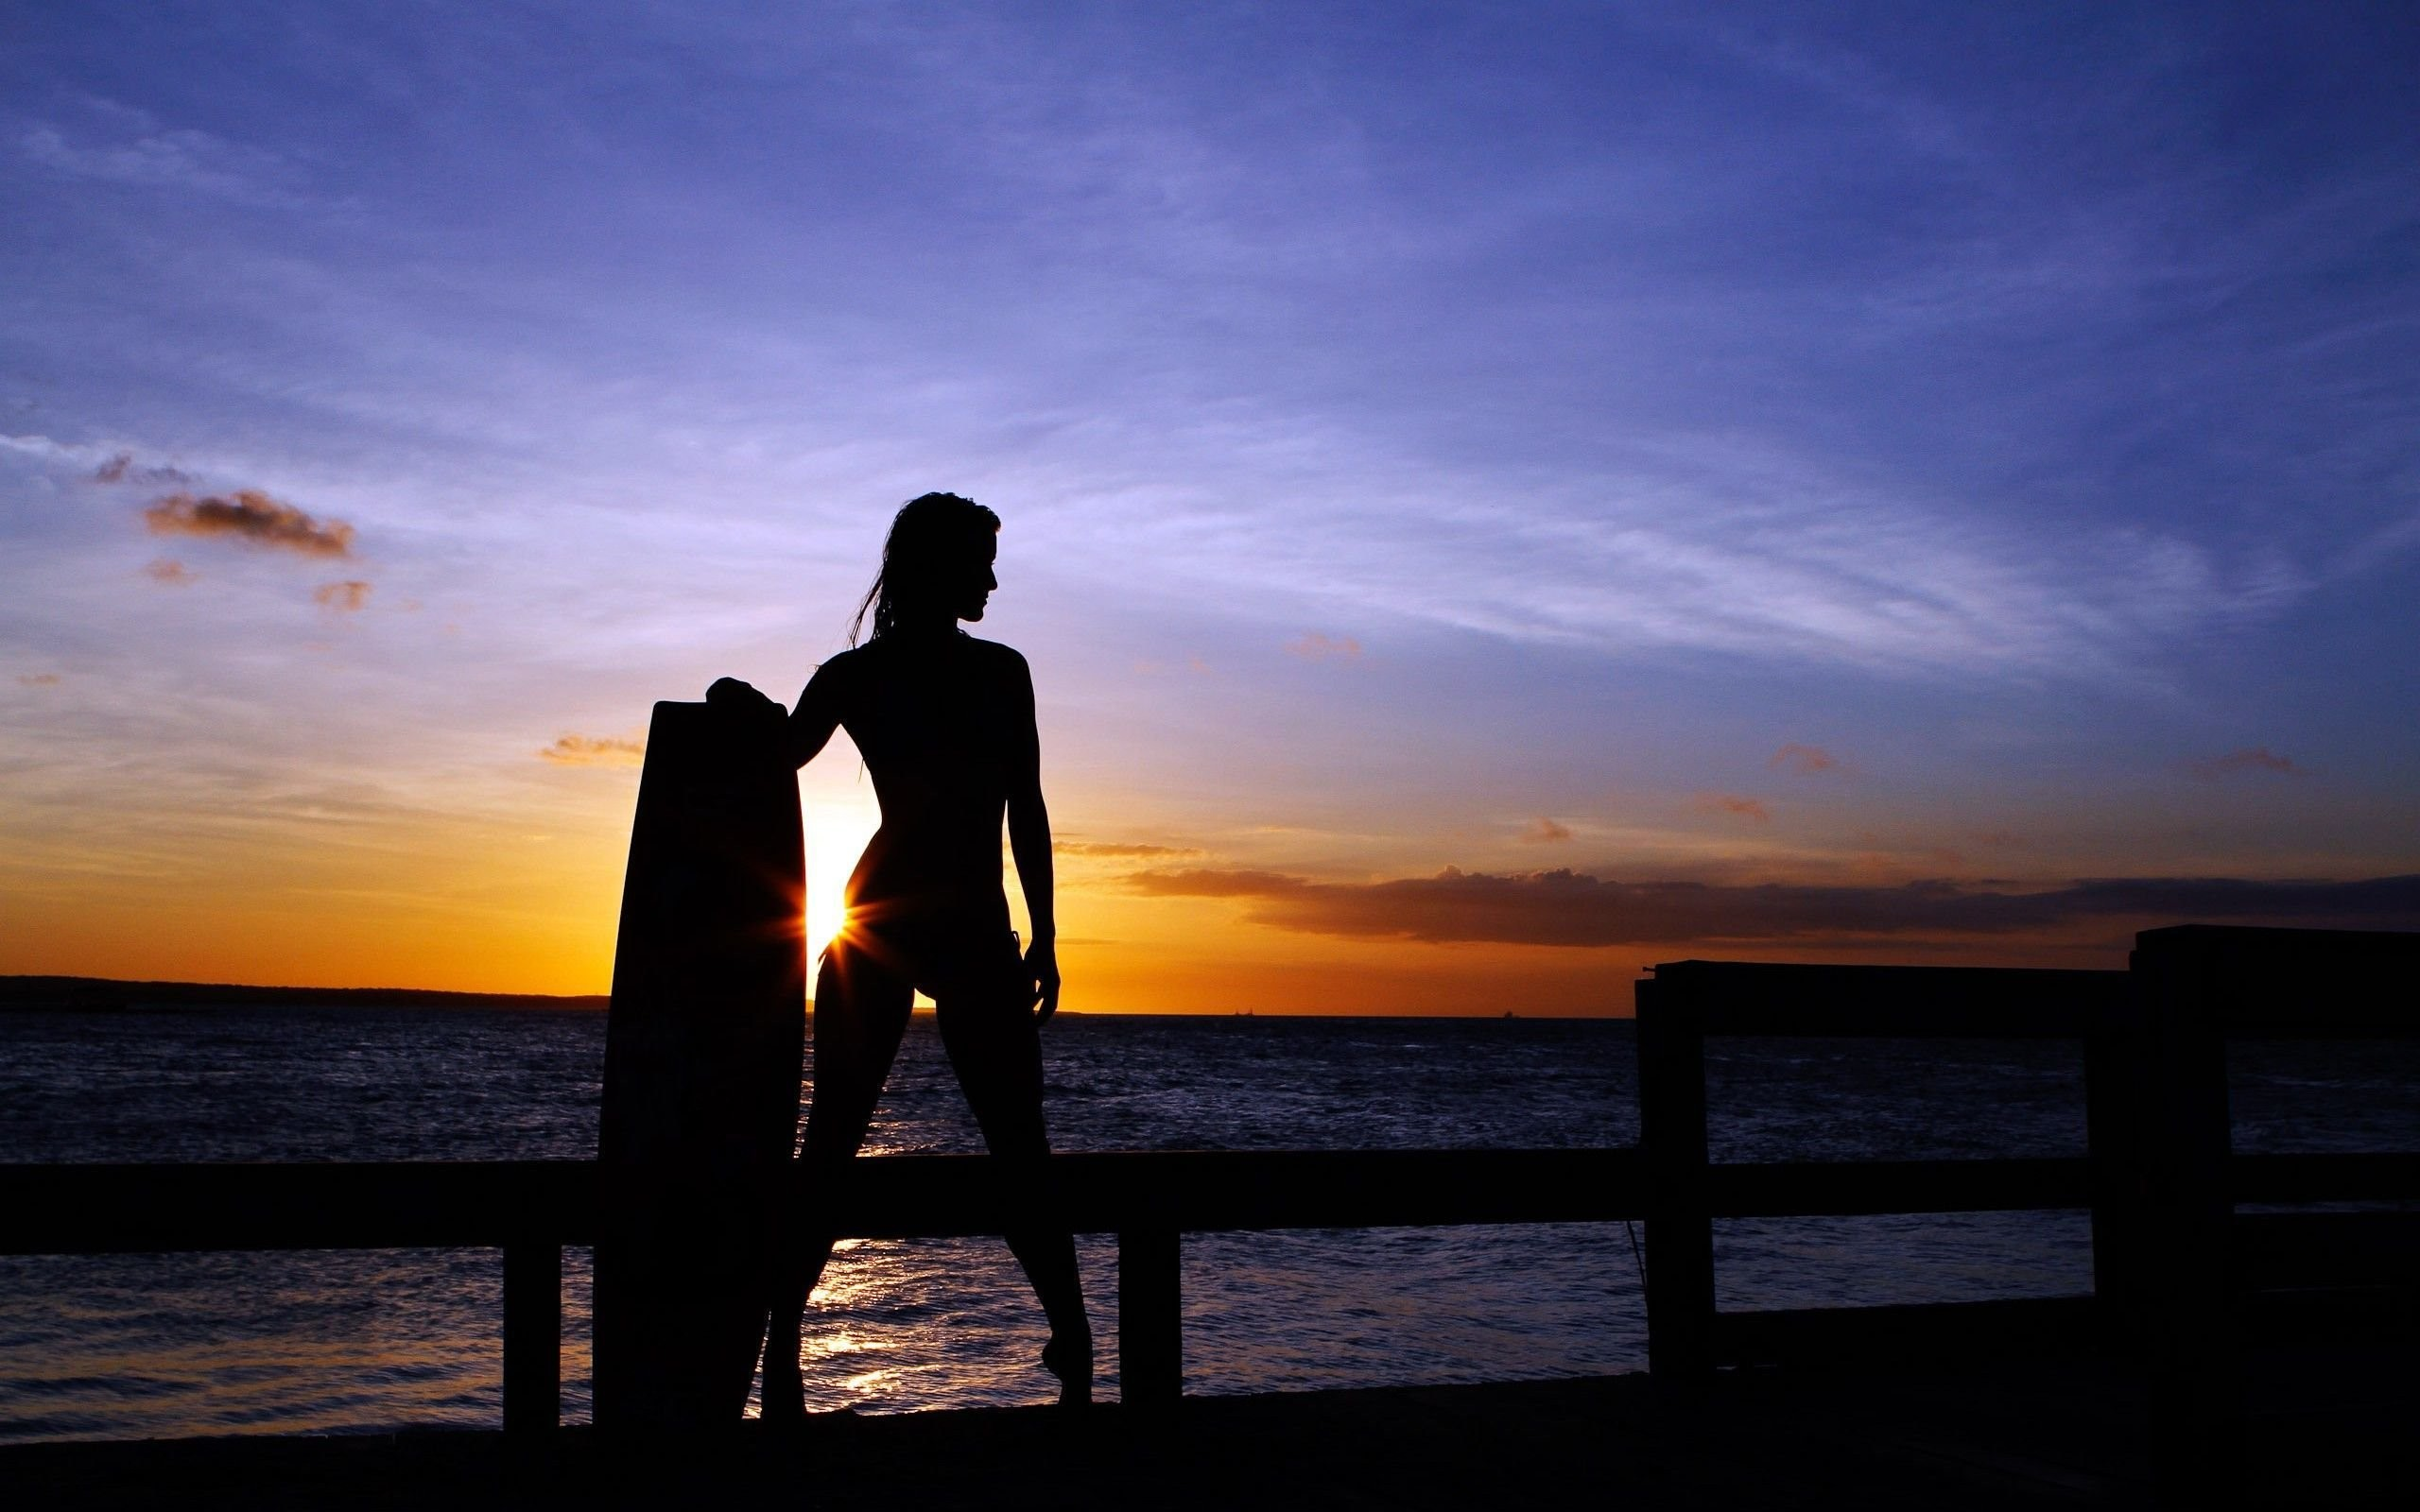 Surfer Girl Silhouette Sunset Wallpaper Surfing Wallpaper For Iphone 66 Images